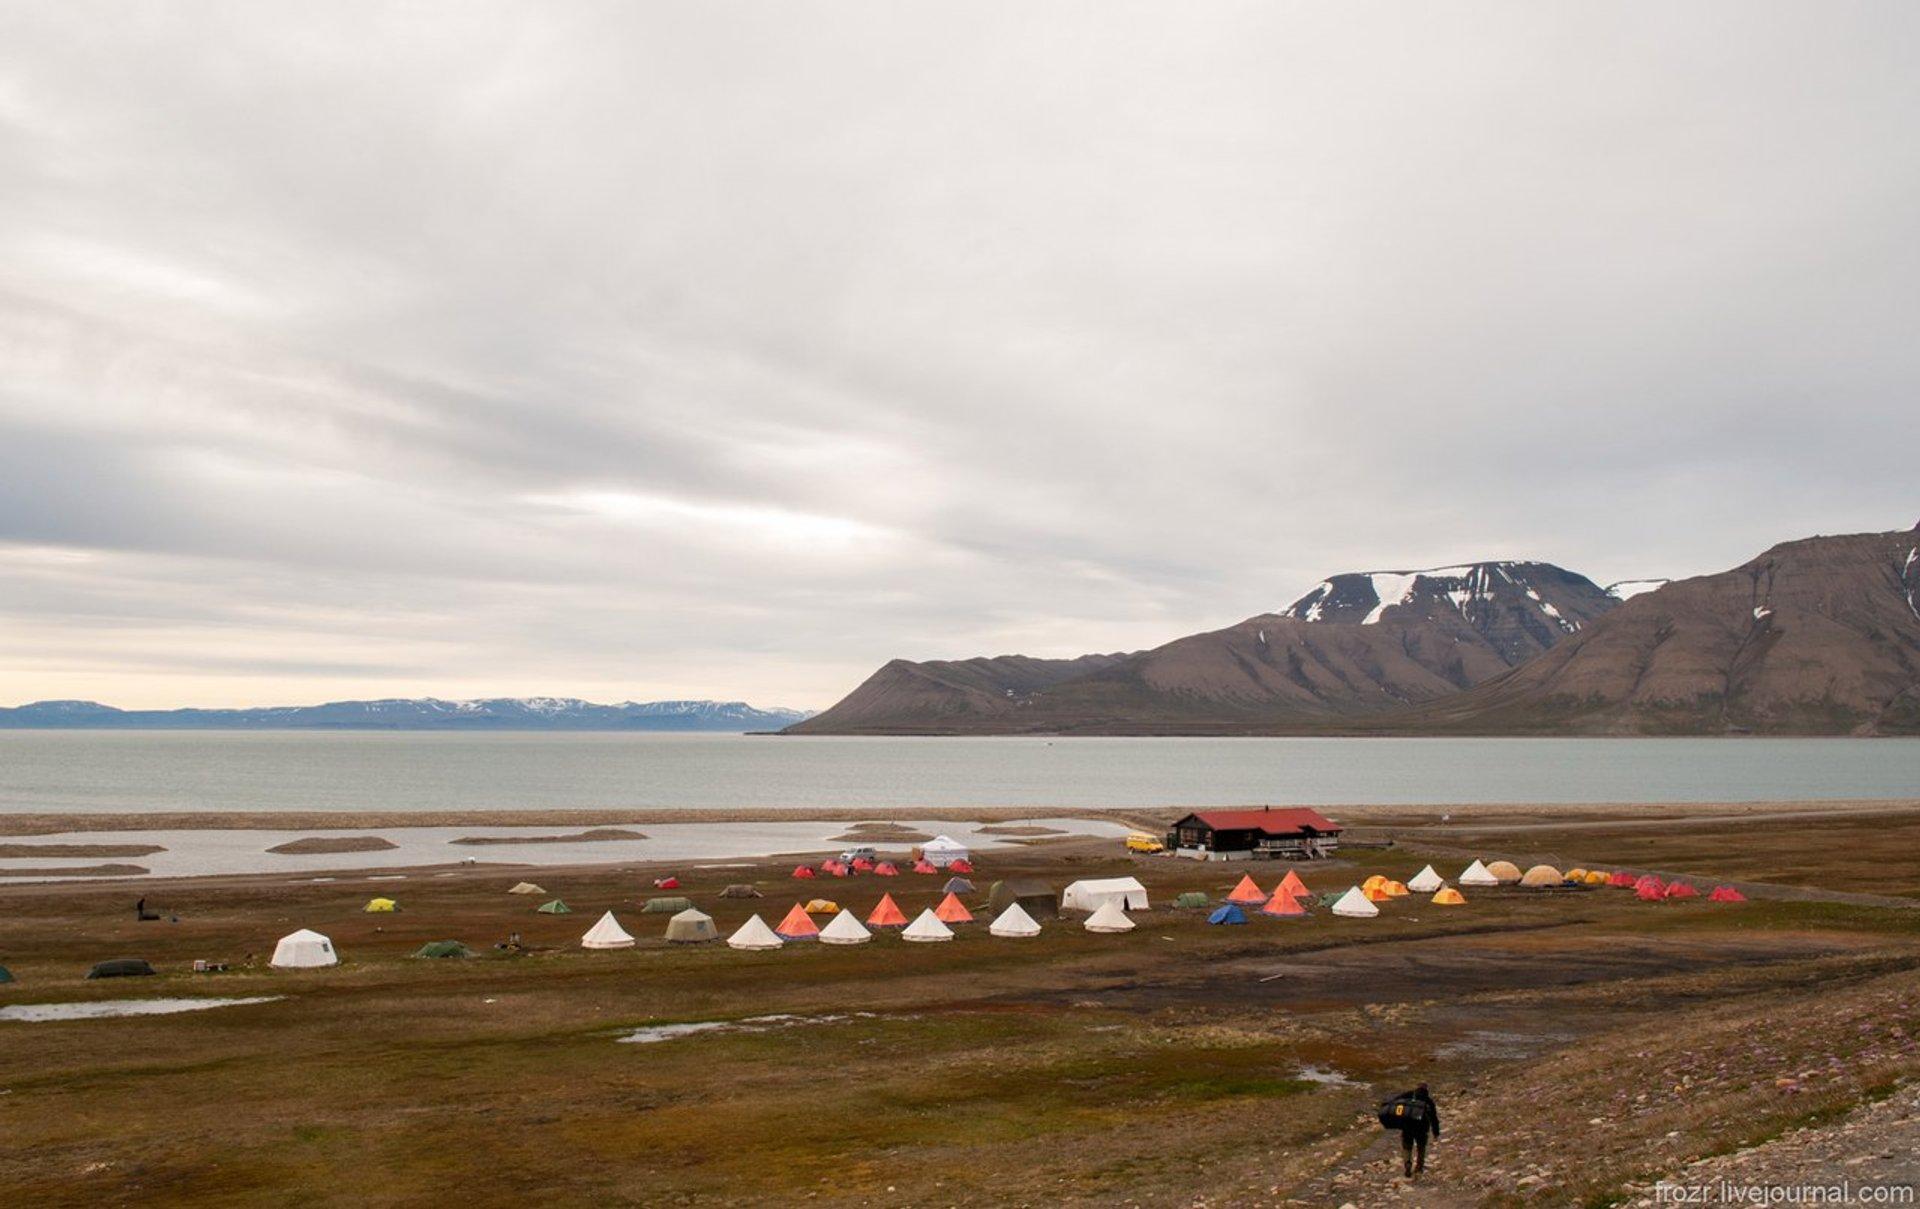 Longyearbyen Camping in Svalbard 2020 - Best Time